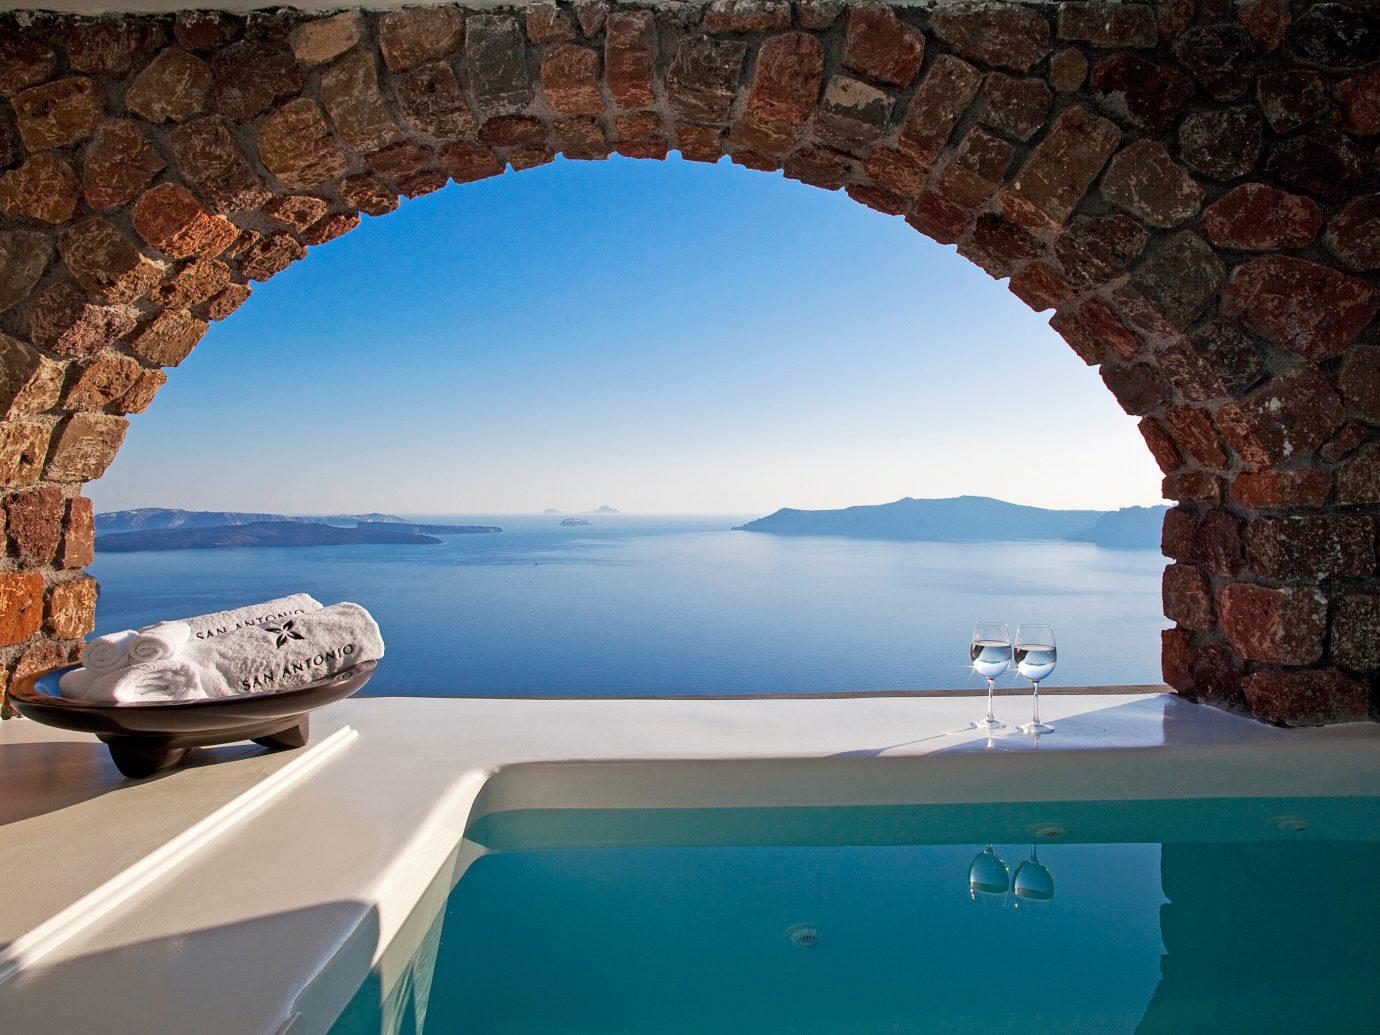 Beach Beachfront Lounge Luxury Modern Ocean Pool Trip Ideas swimming pool building arch estate vacation Villa stone